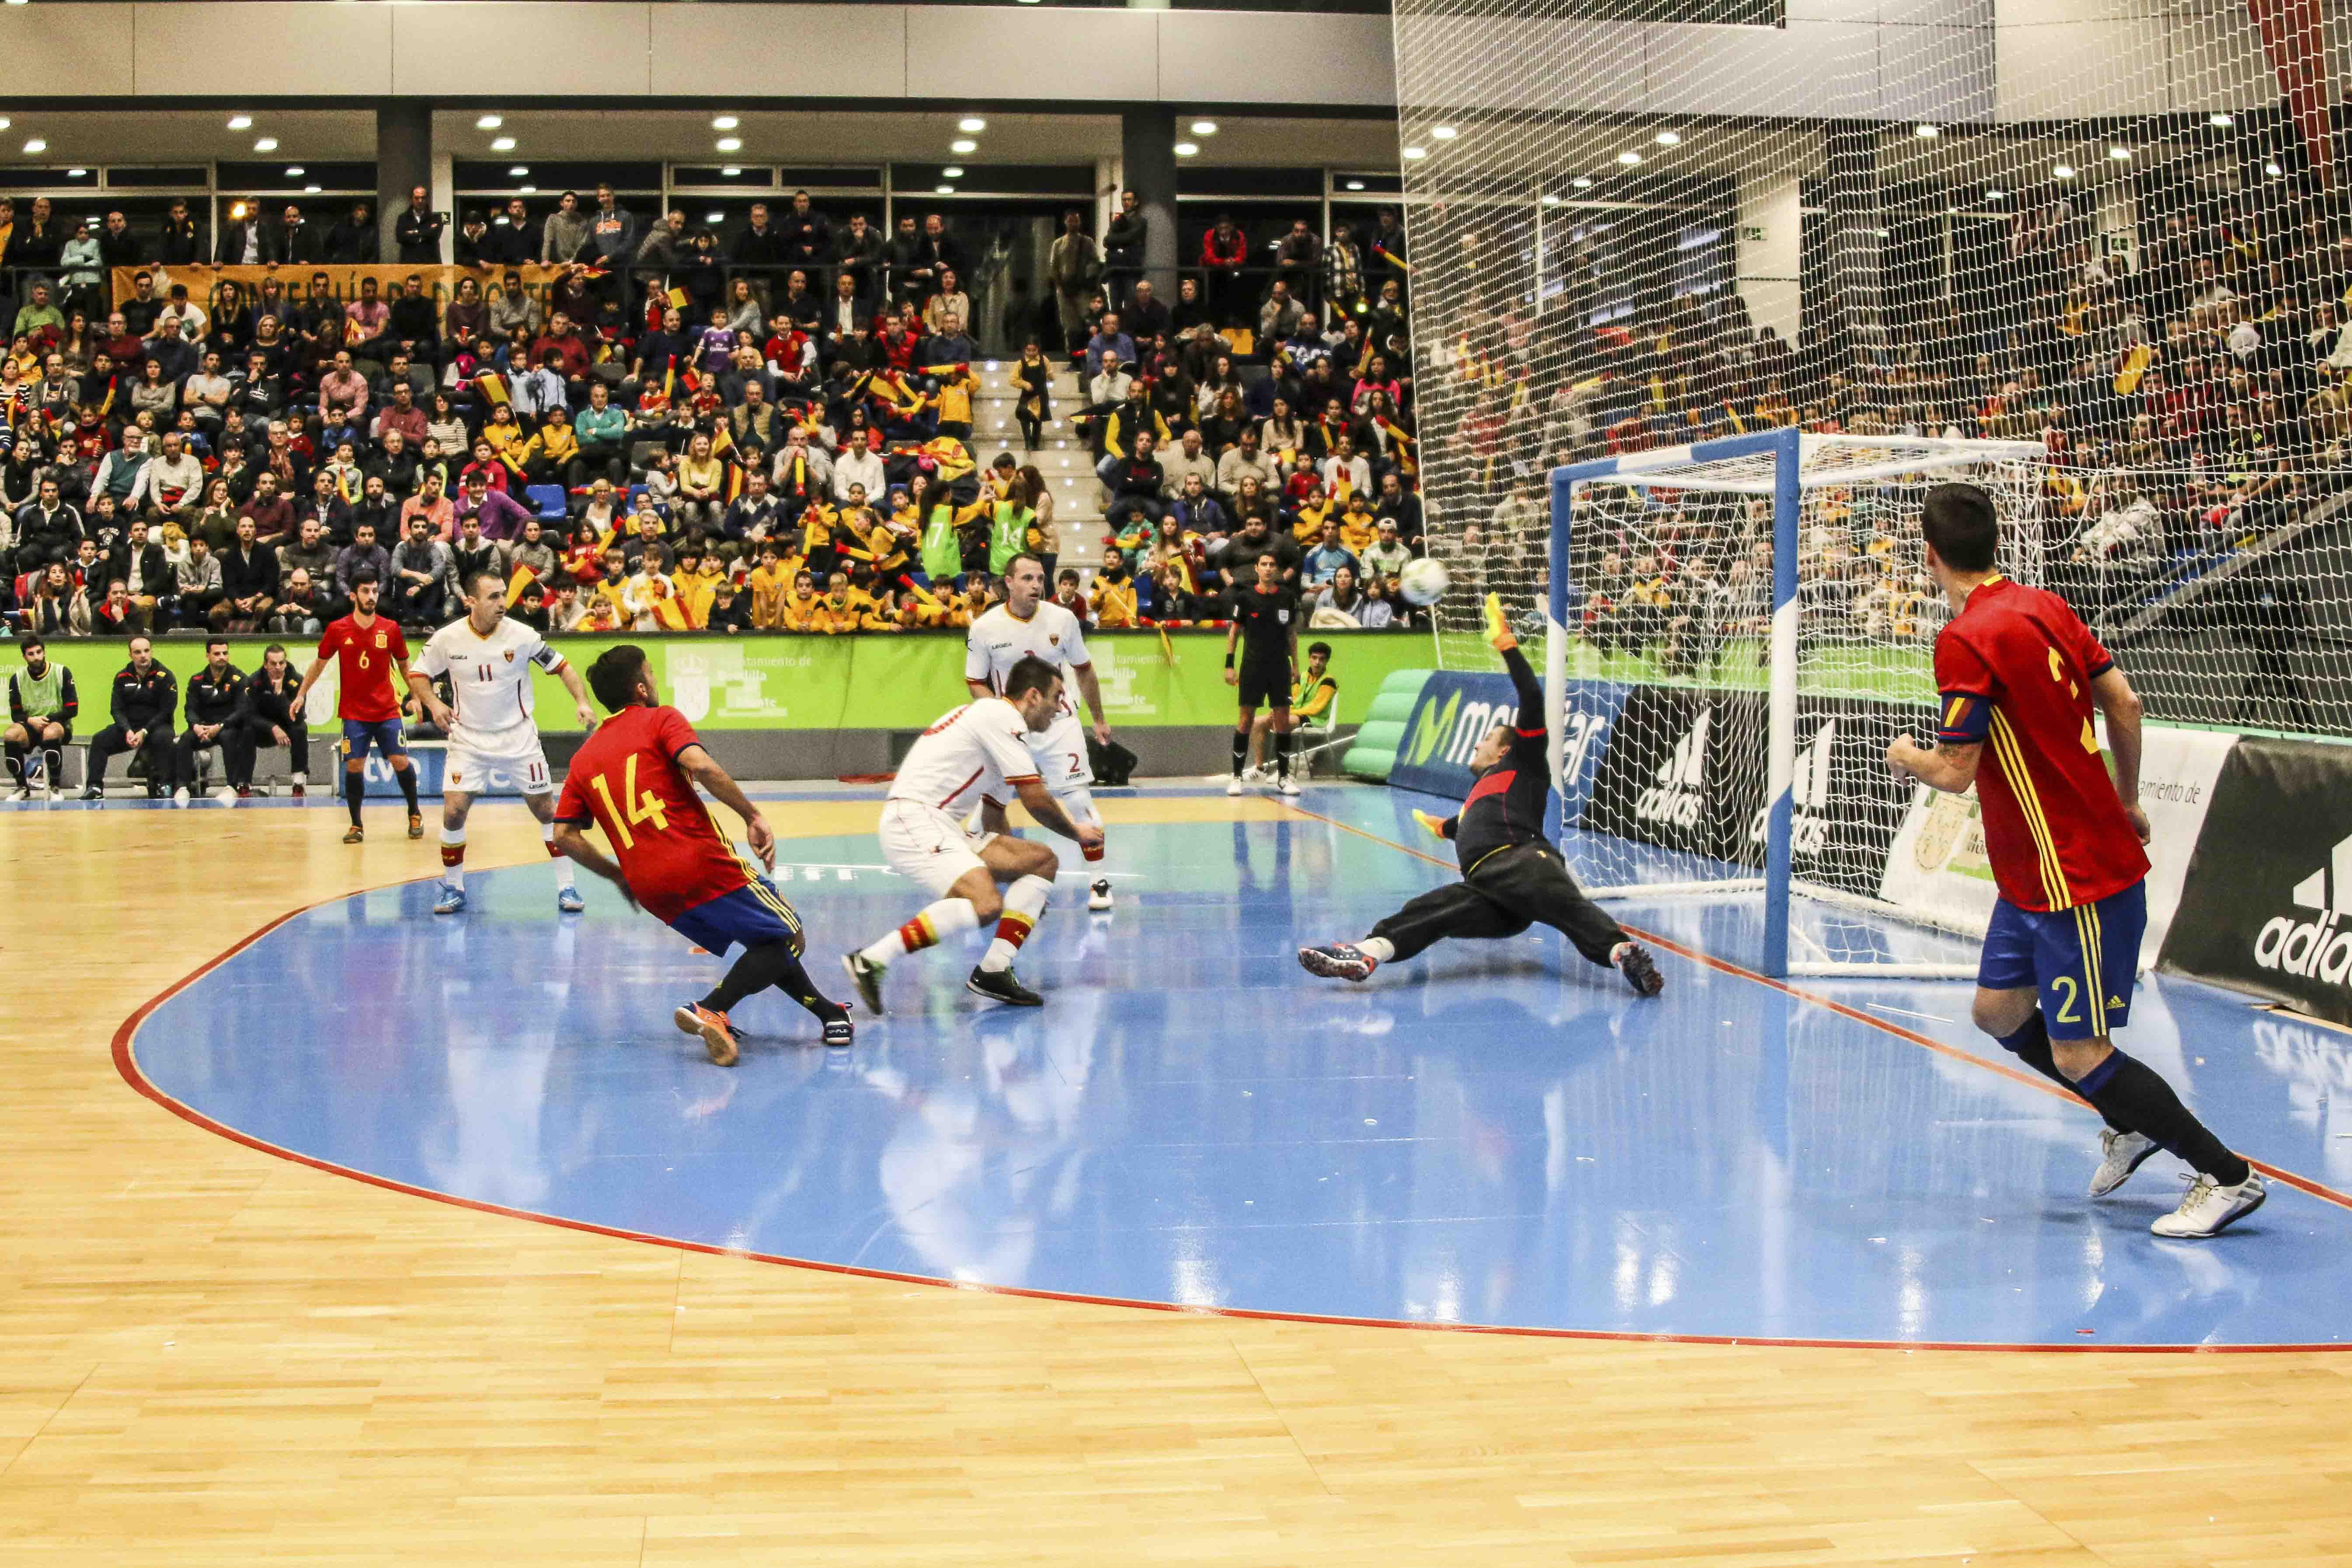 Boadilla vibr con la selecci n espa ola de f tbol sala for Federacion espanola de futbol sala